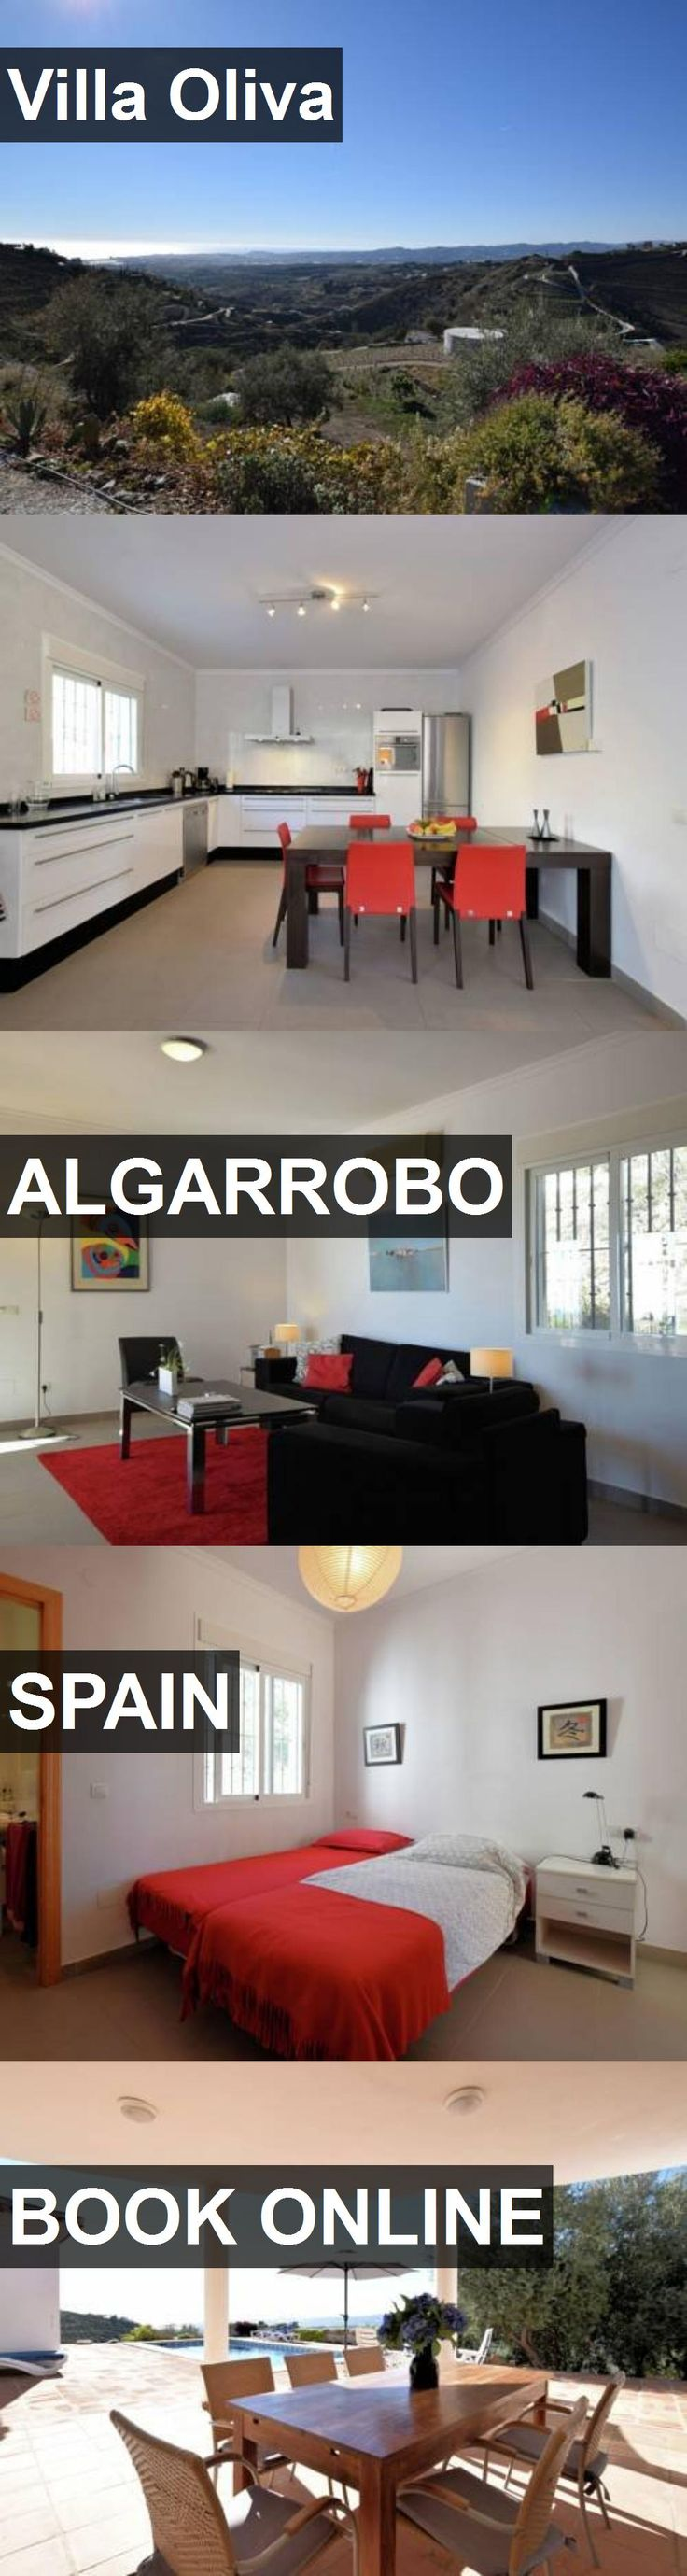 Hotel Villa Oliva in Algarrobo, Spain. For more information, photos, reviews and best prices please follow the link. #Spain #Algarrobo #travel #vacation #hotel